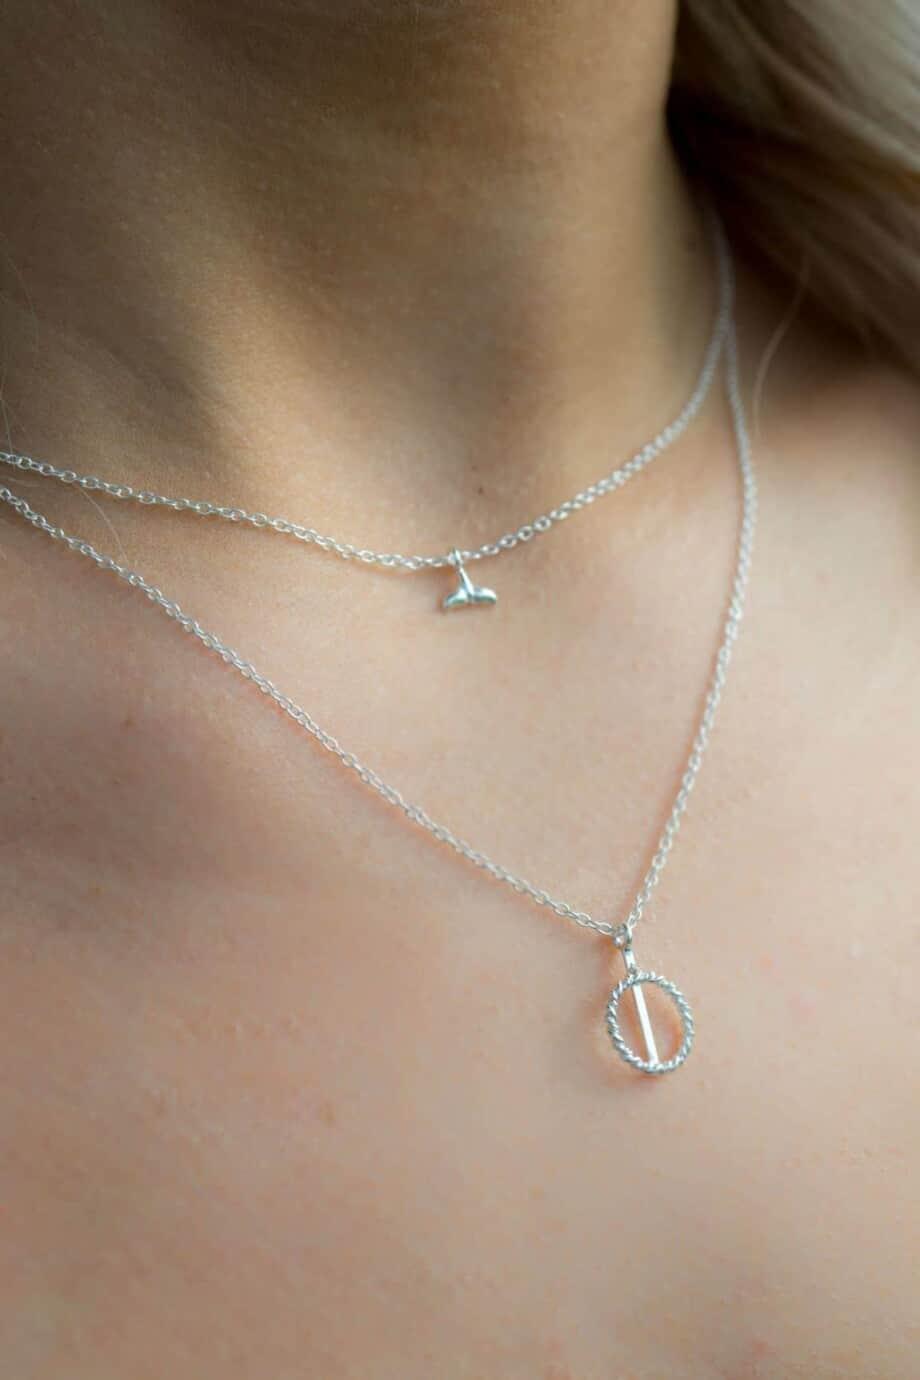 Zilveren ketting met hanger 'Whale' en 'Twisted circle'